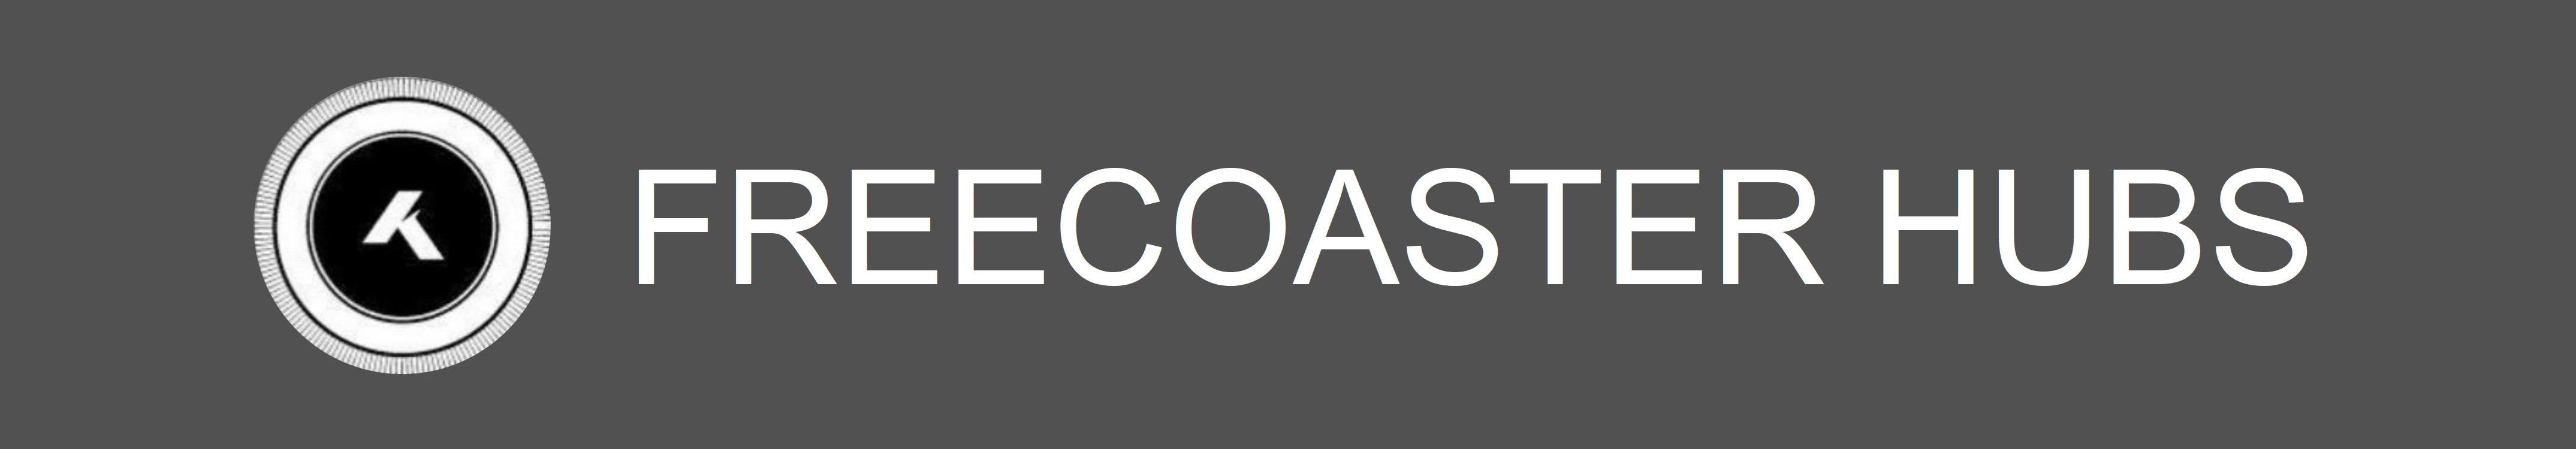 Freecoaster-Hubs